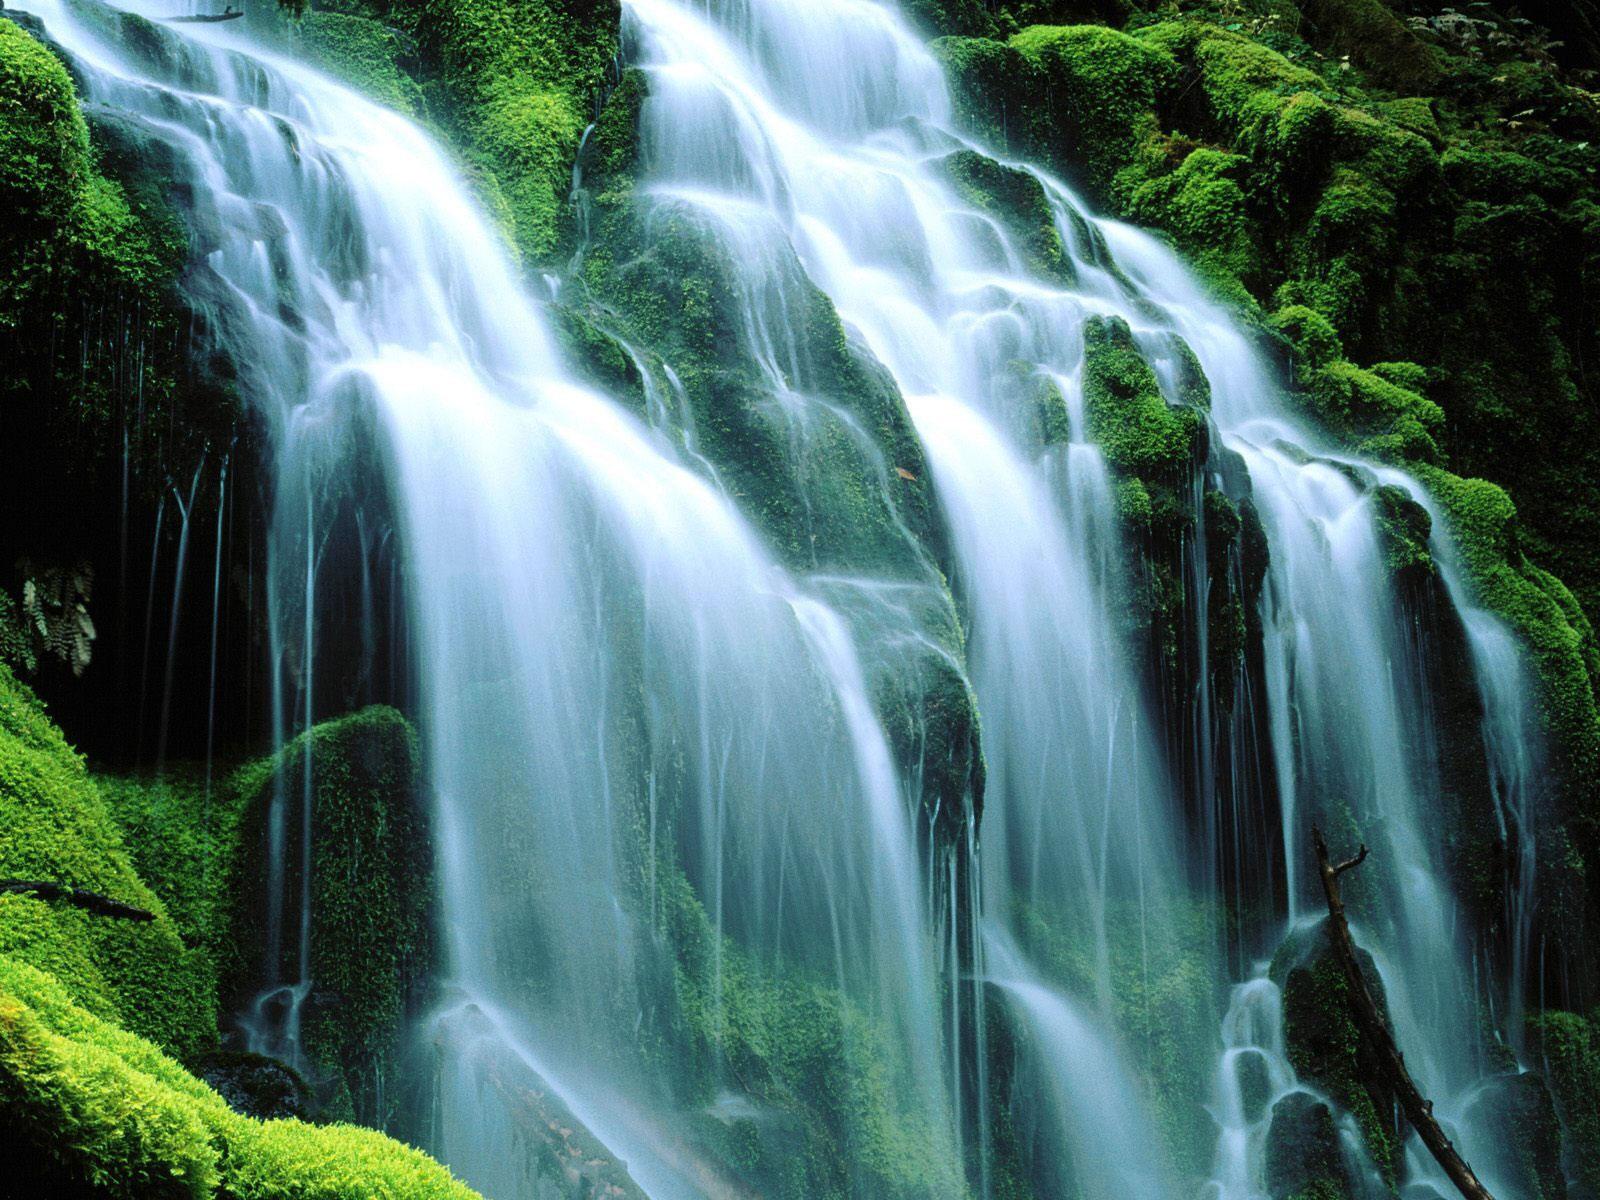 Poxy falls waterfalls.